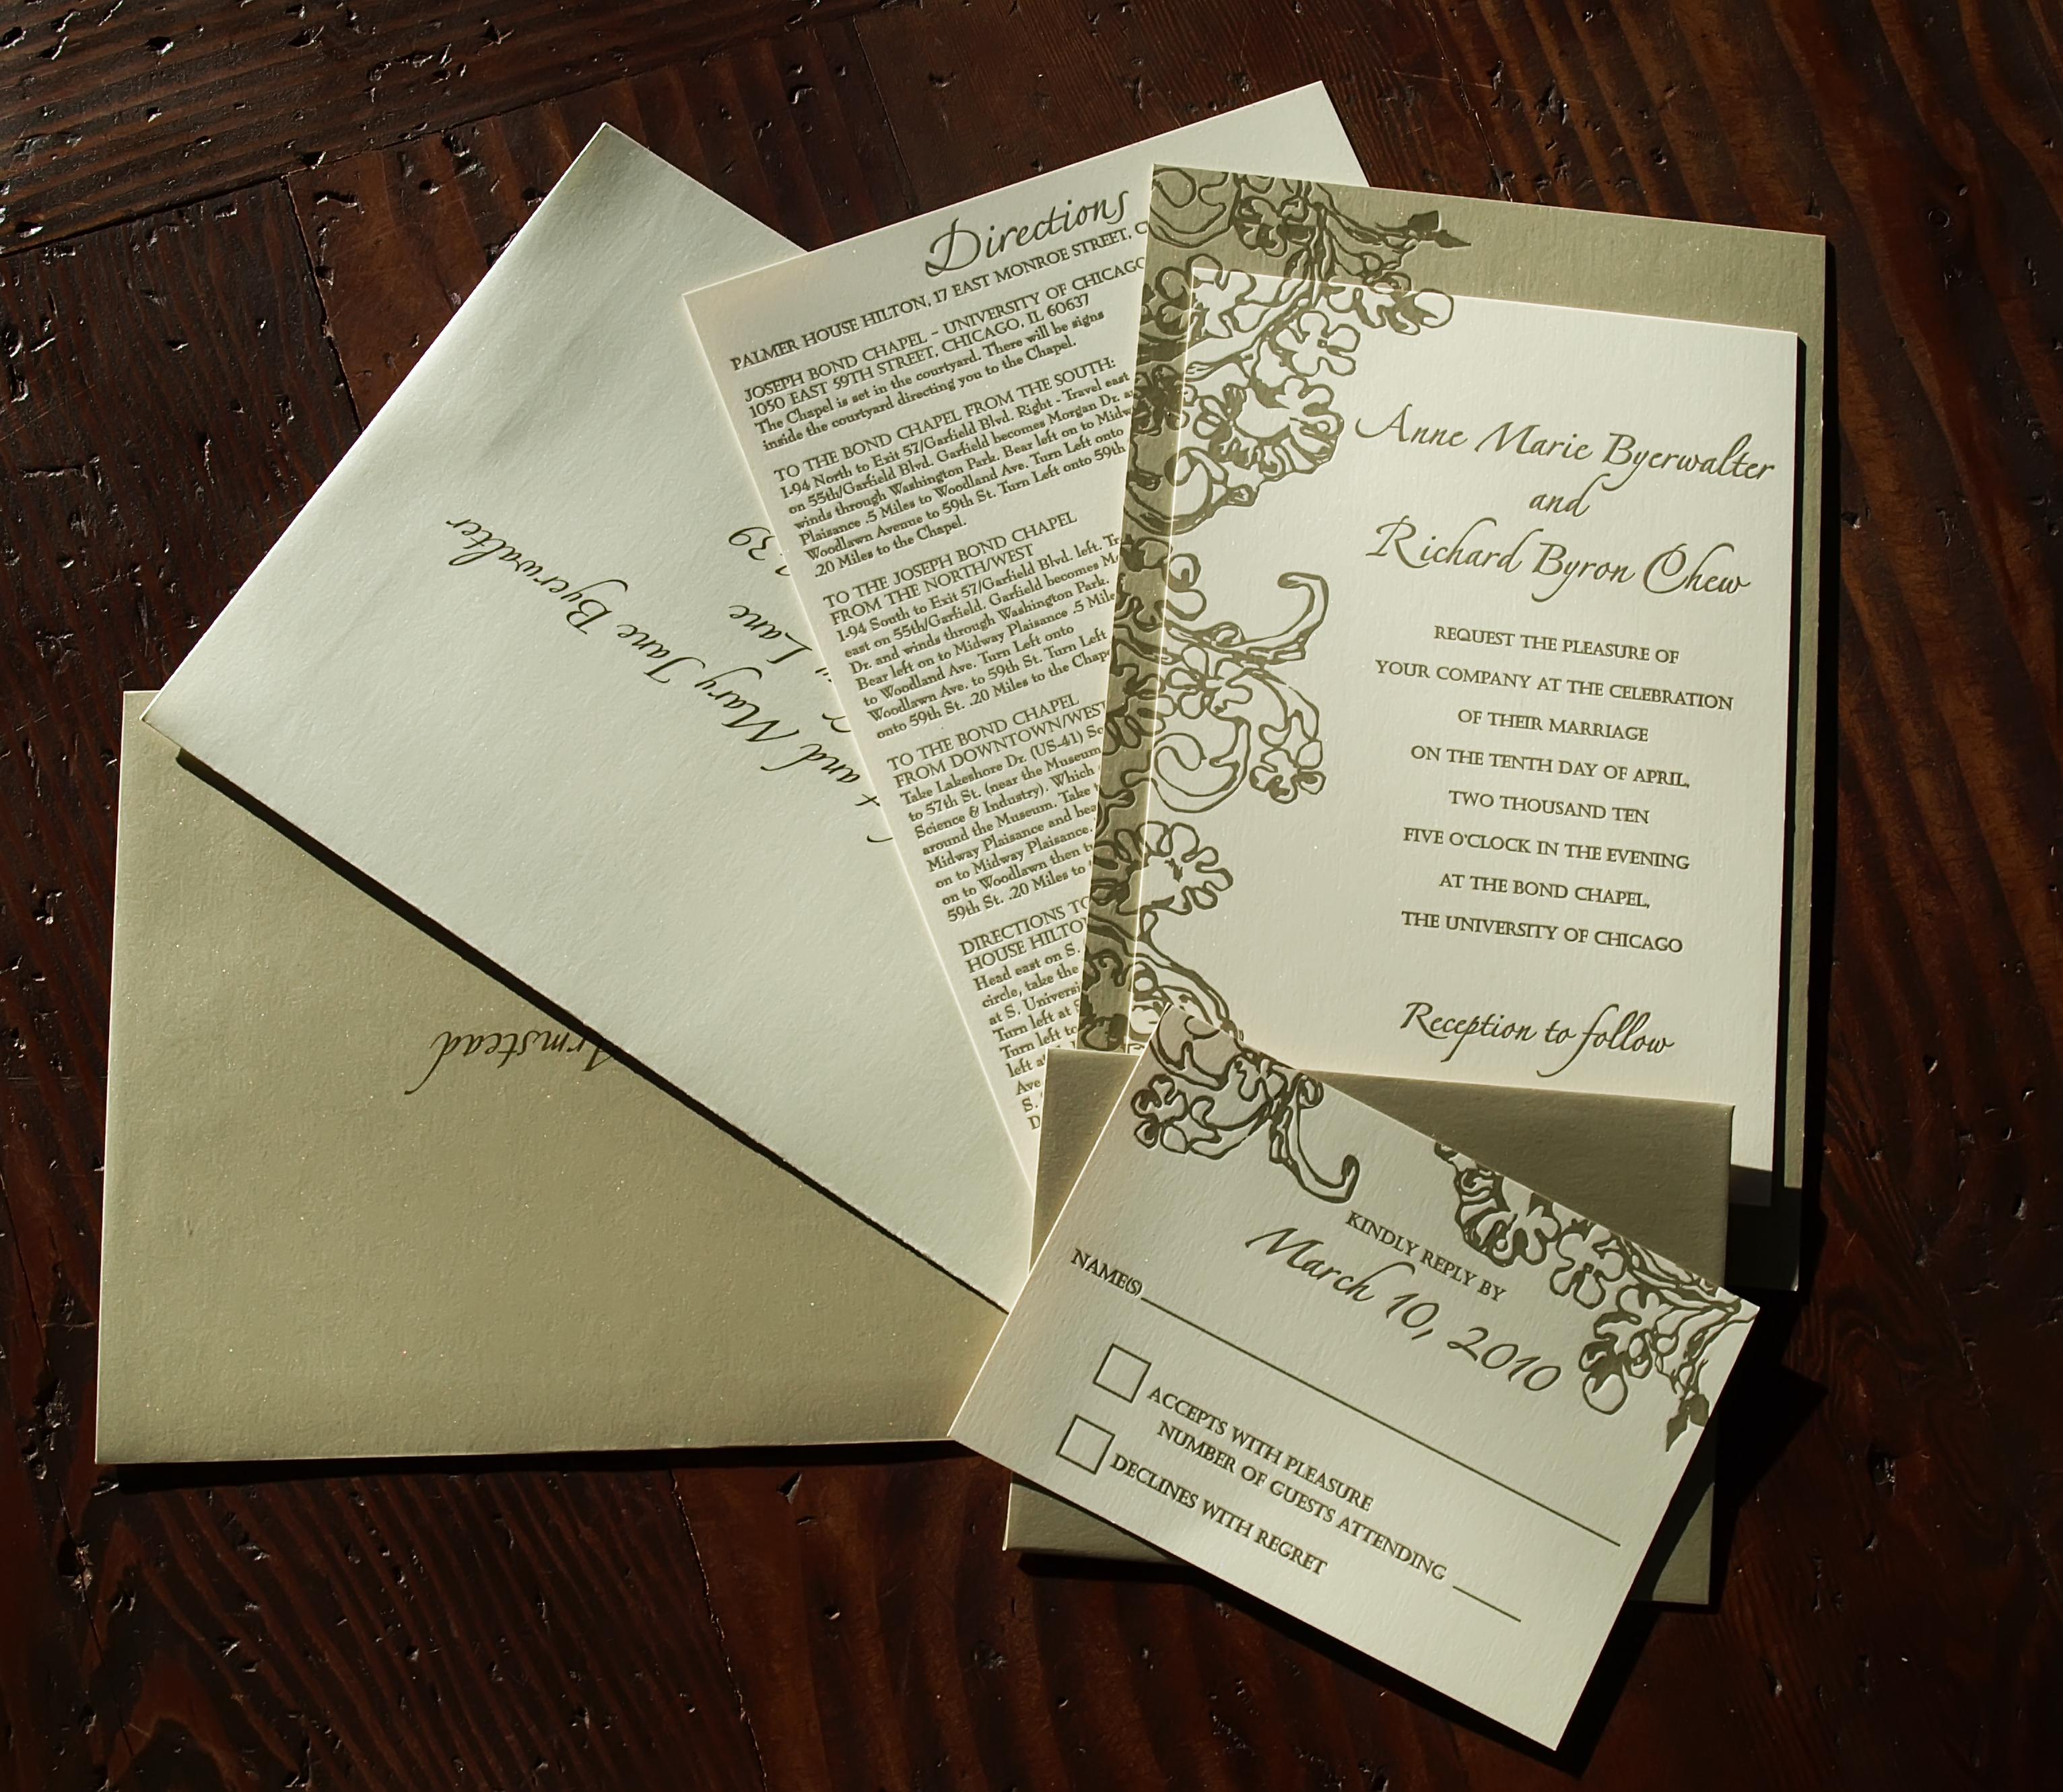 Matchy Matchy Letterpress Invite And Handmade Envelope: Letterpress Wedding Invitation Set - 6 X 9 - Gold